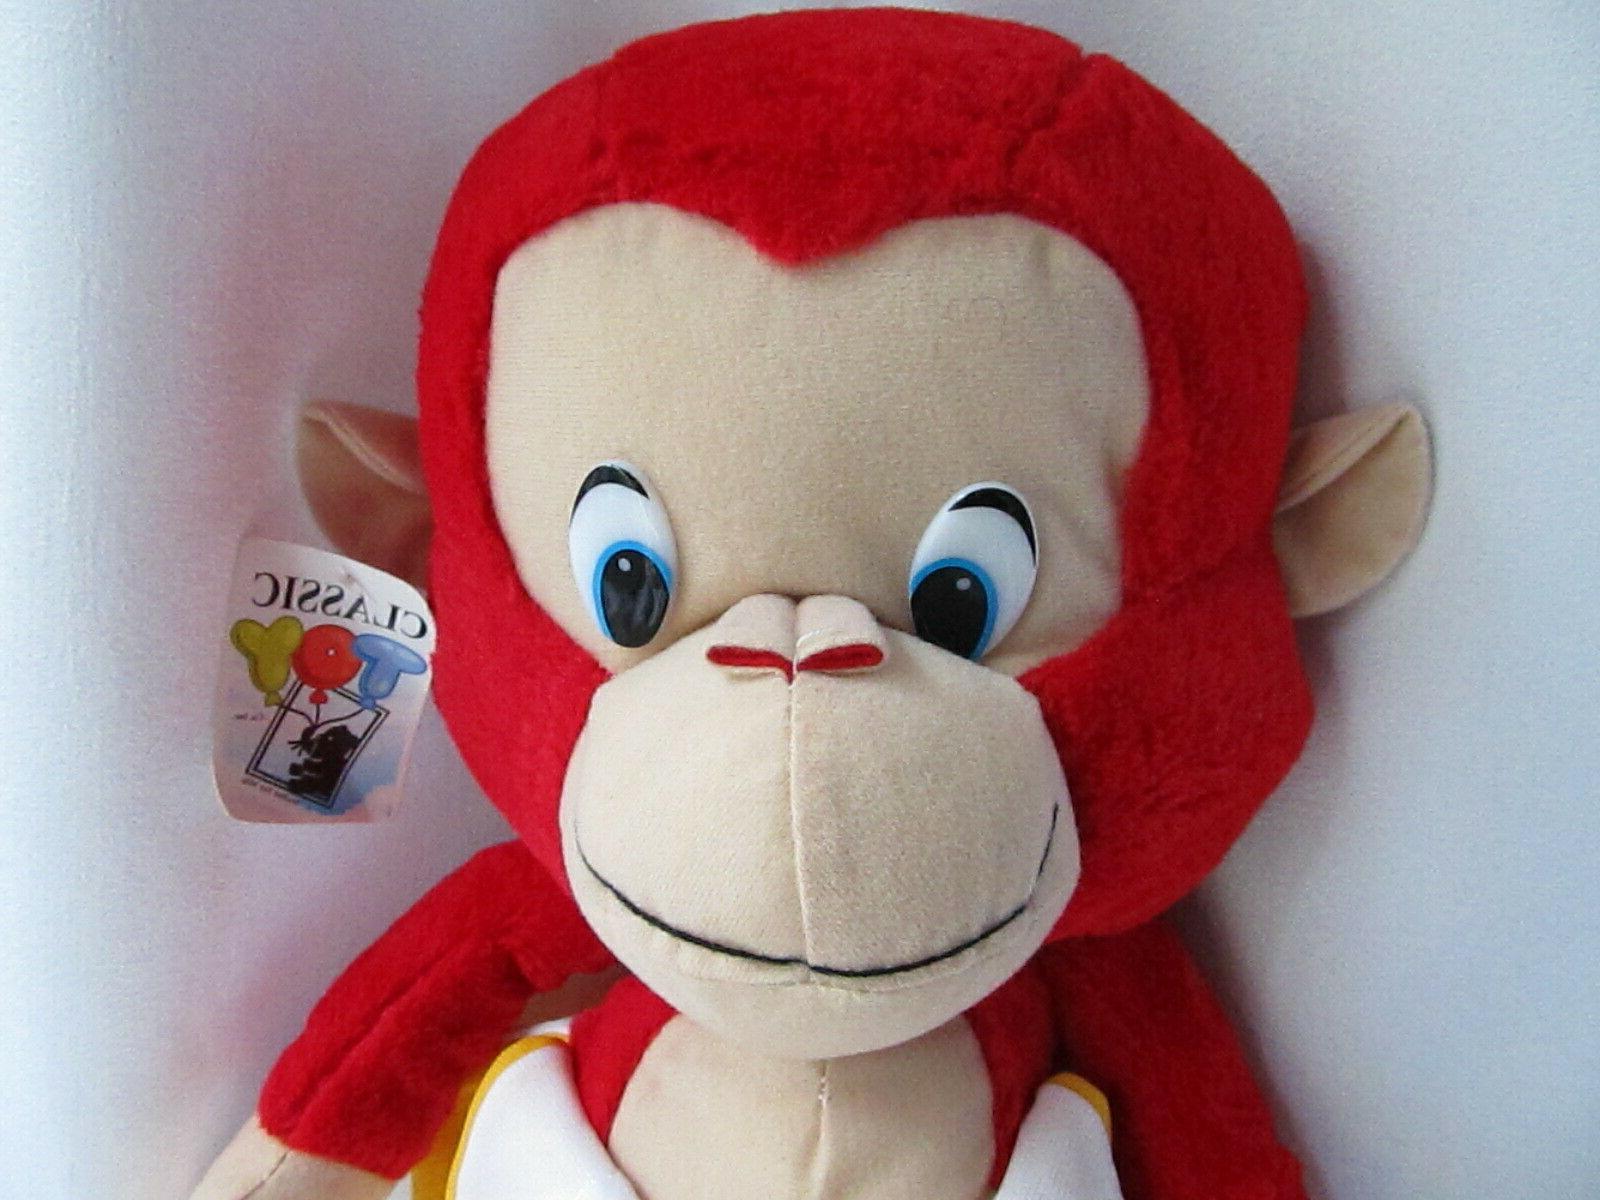 "Classic Toy Red Monkey Banana Plush 21"" w/tag Toy"